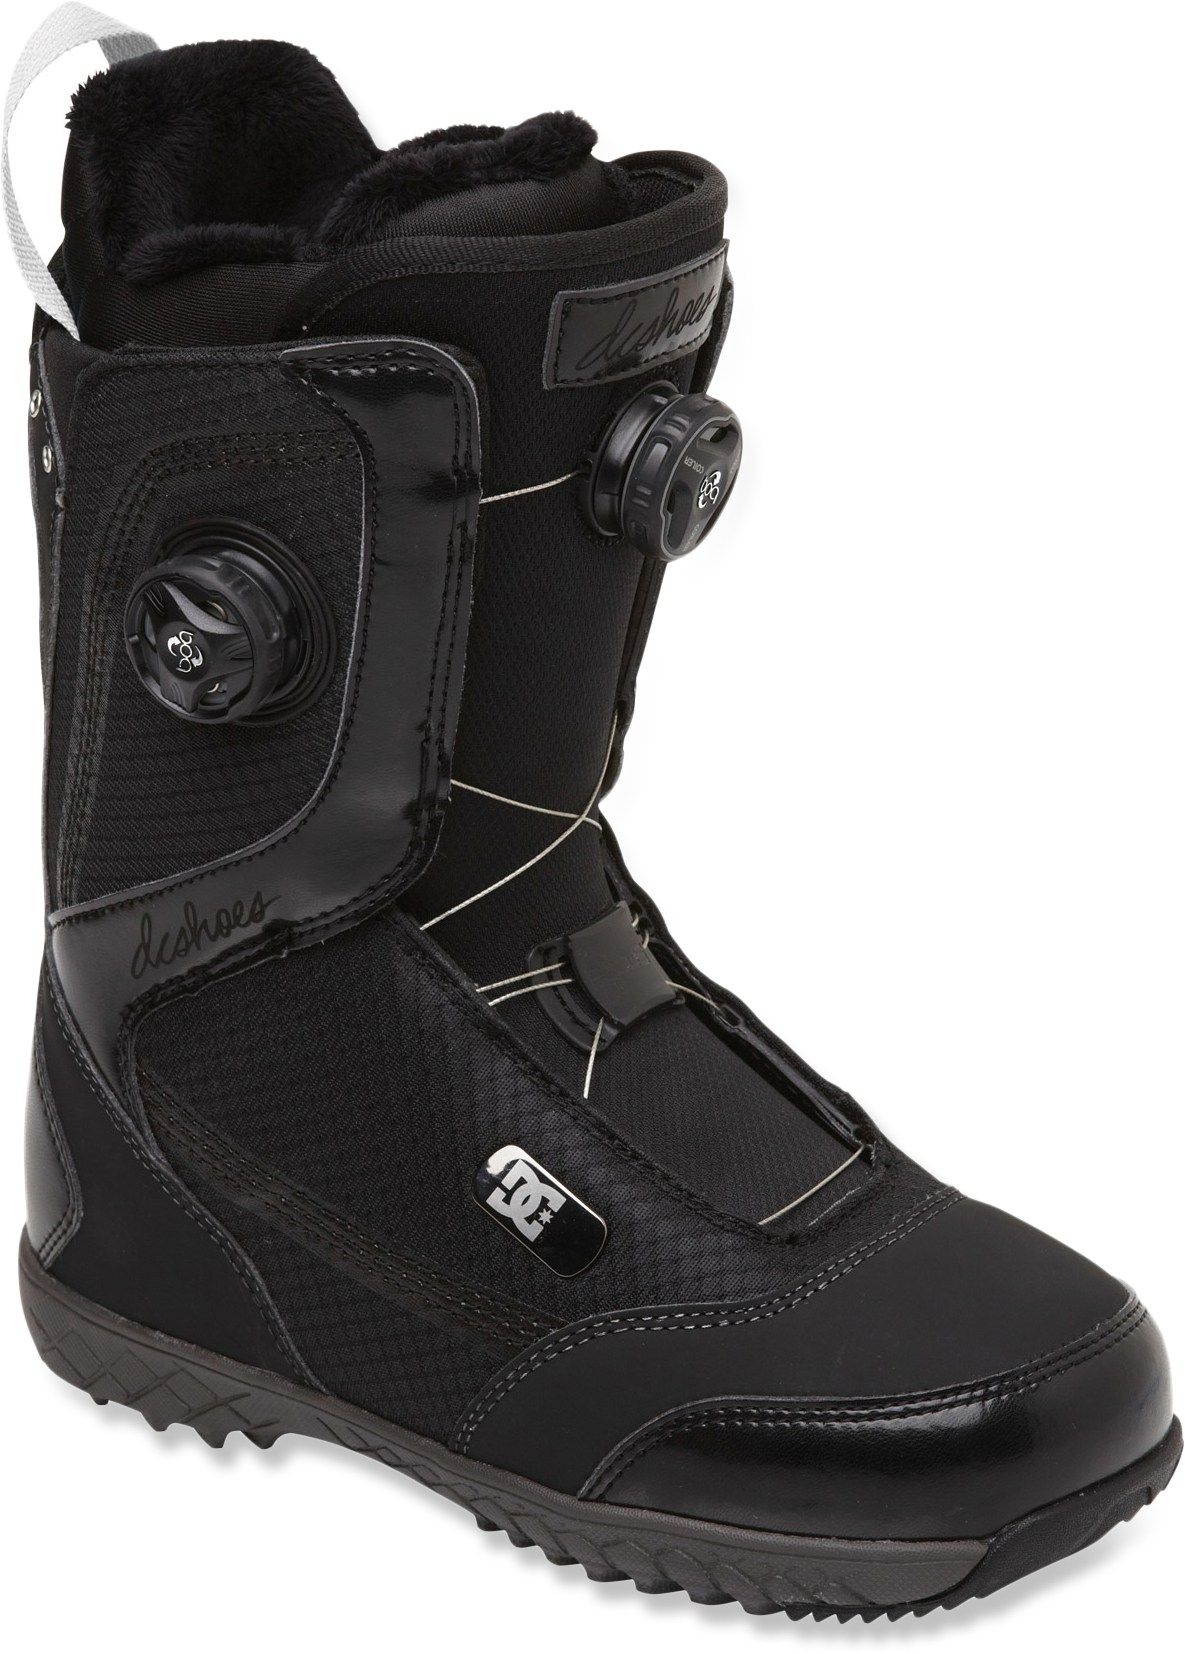 DC Mora Boa Snowboard Boots Women's 2013/2014 Boots